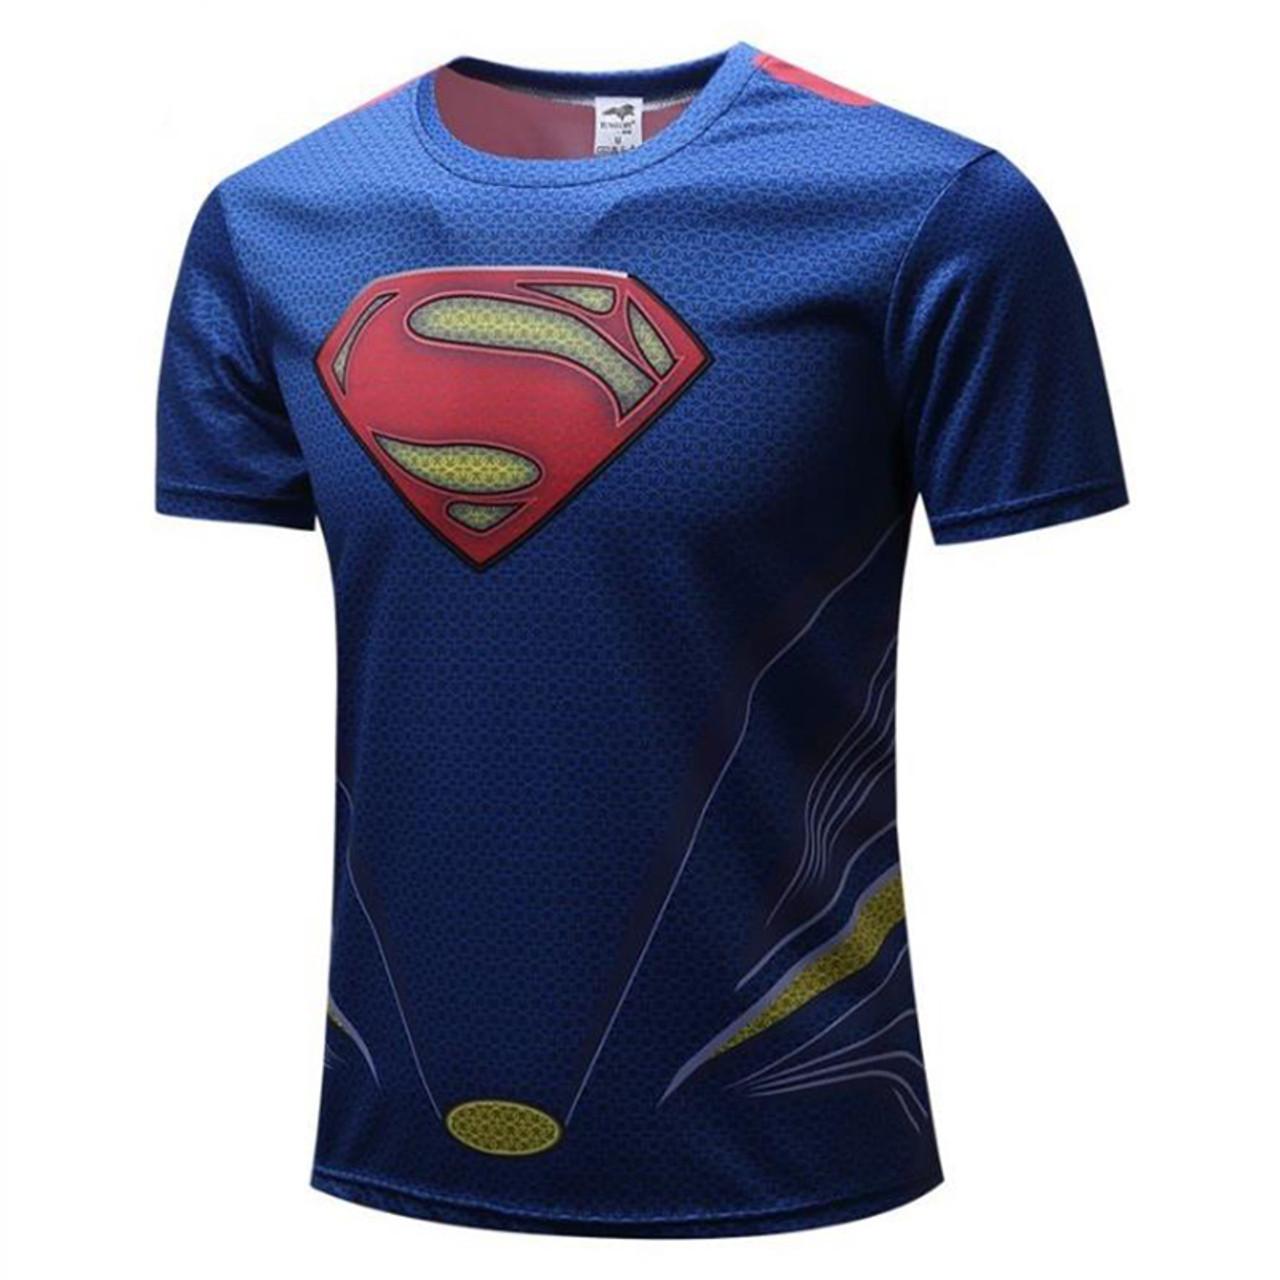 f06f6d9f10e ... Boy T-shirt Cartoon Superheroes Batman Avengers Captain America Round  Collar Short Sleeve T- ...